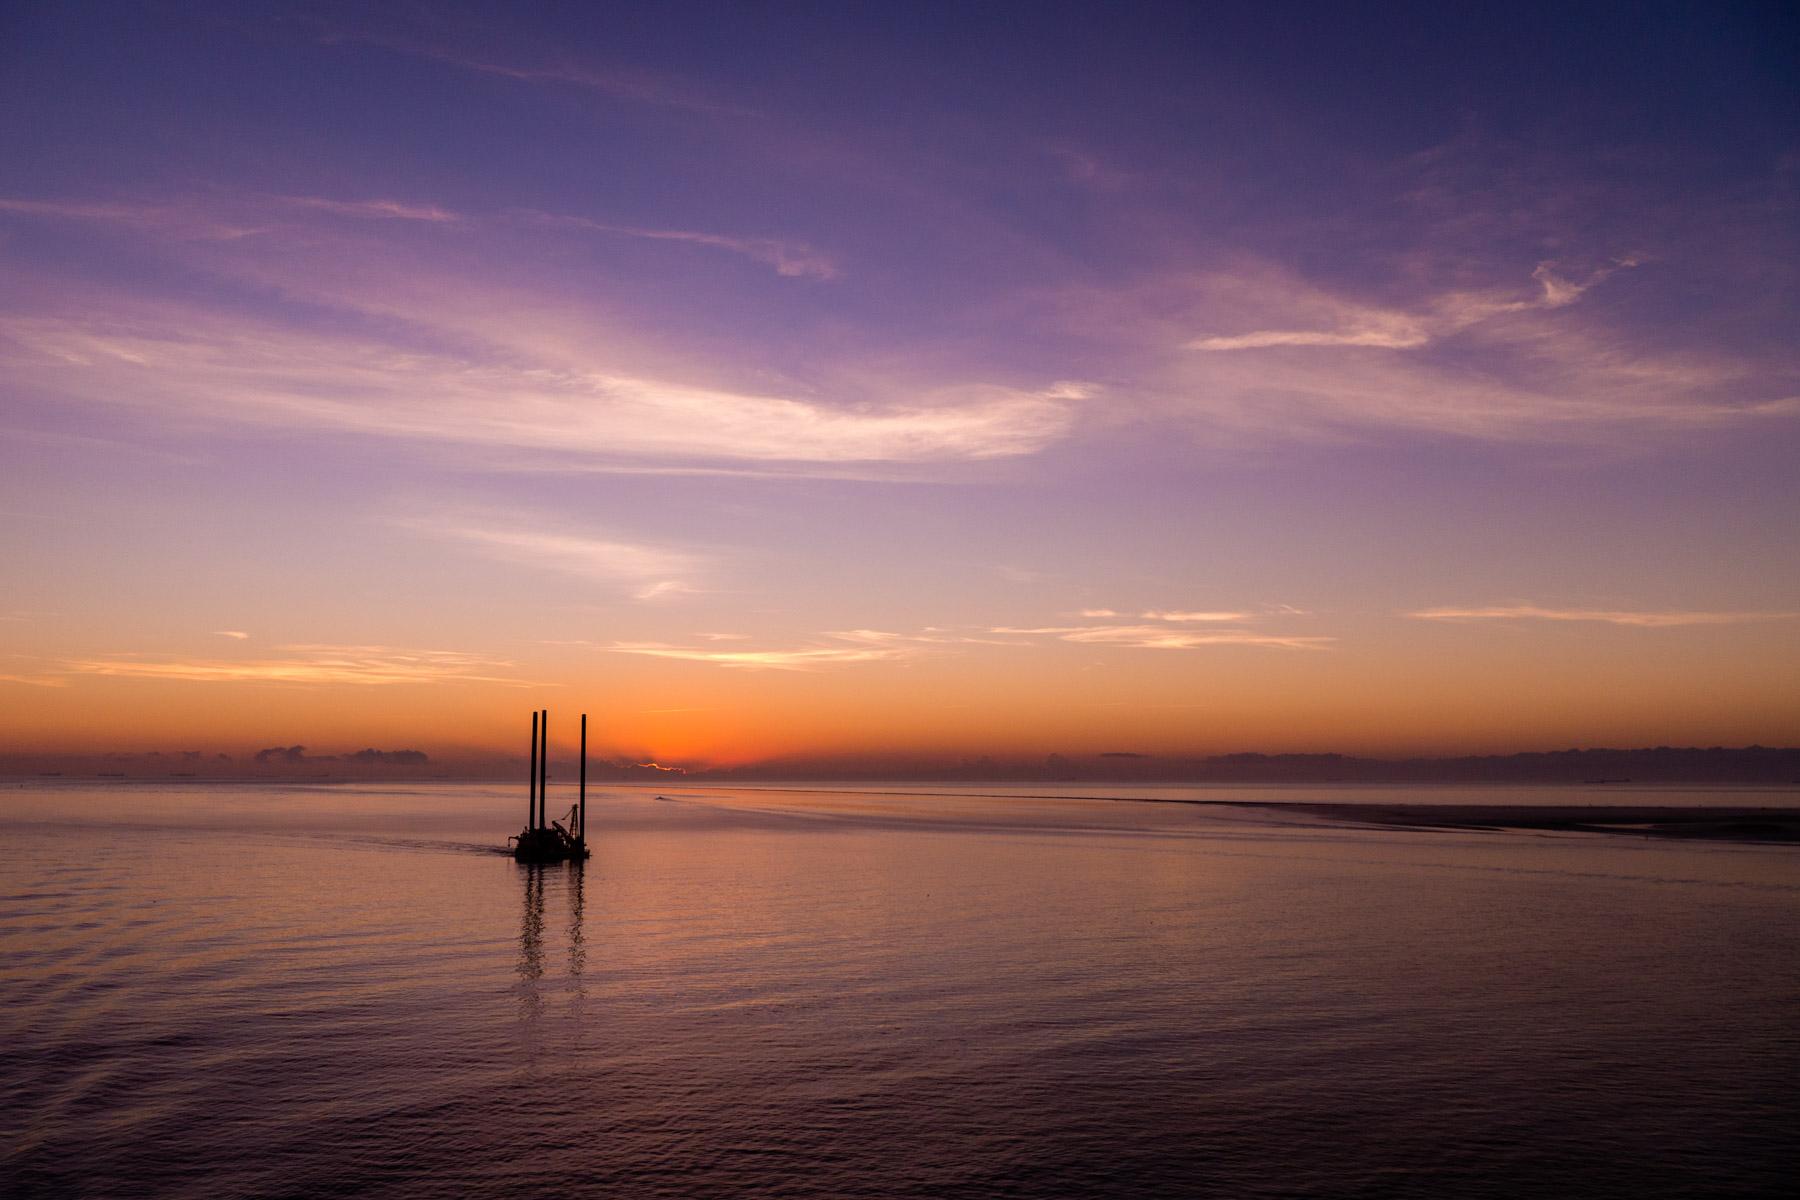 The Liftboat at Sunrise